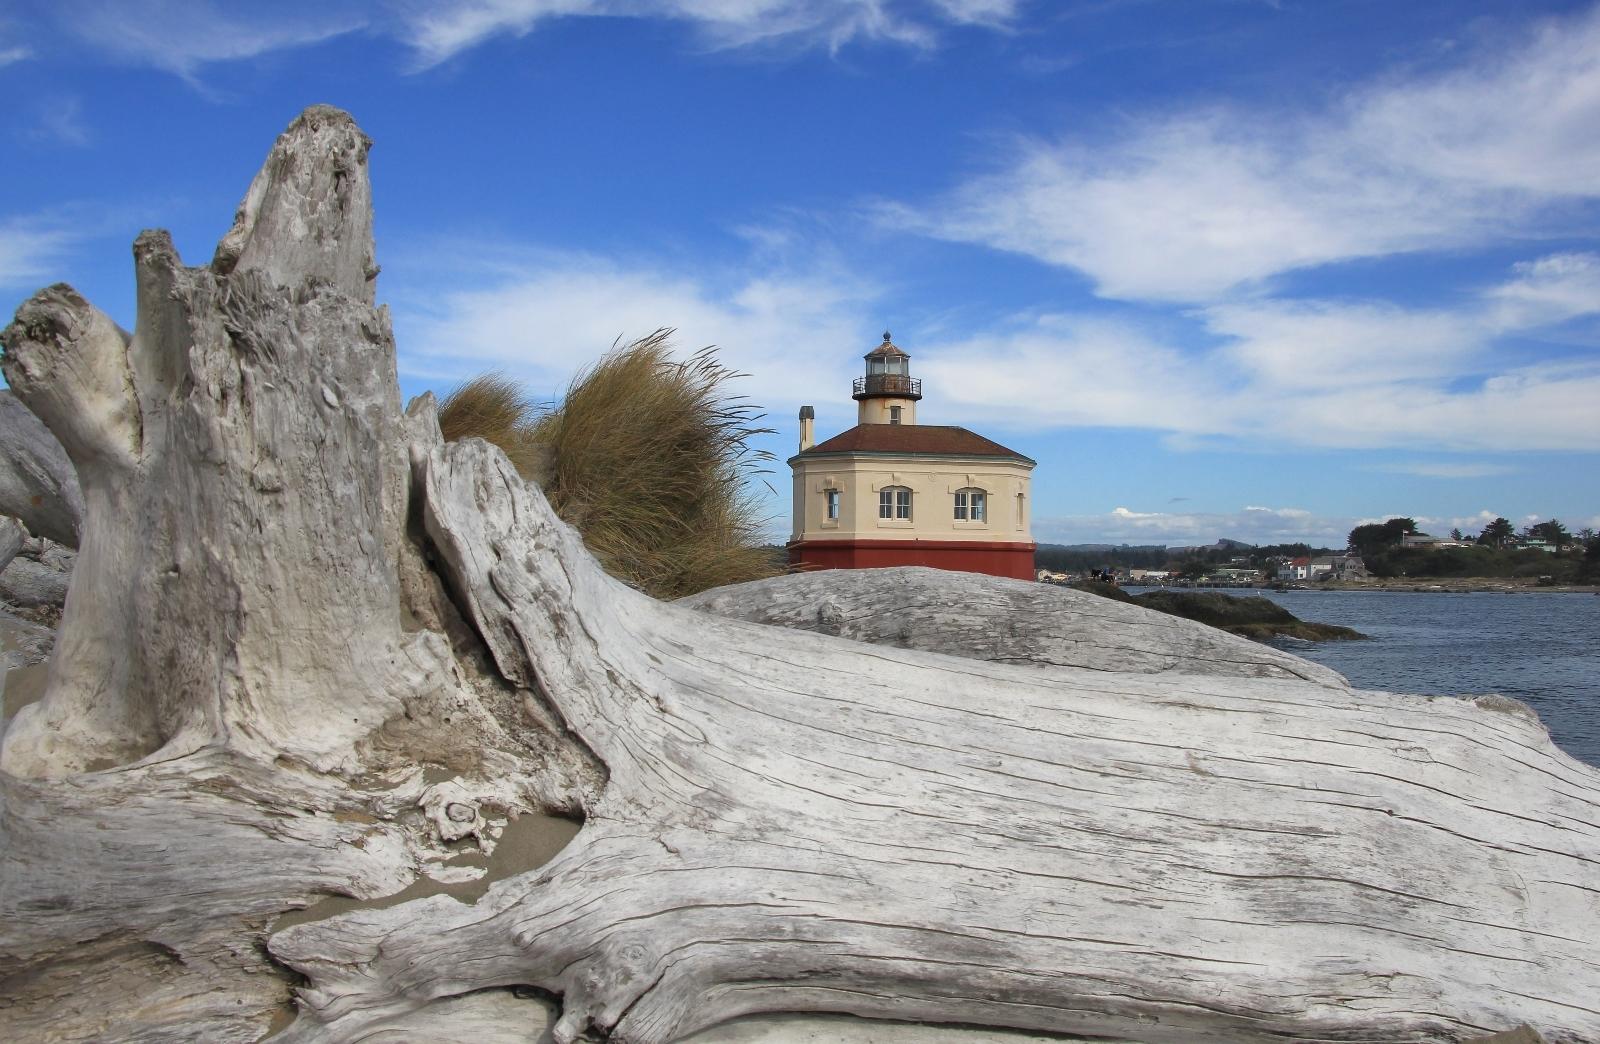 09-04-16-oregon-coast-shore-acres-193